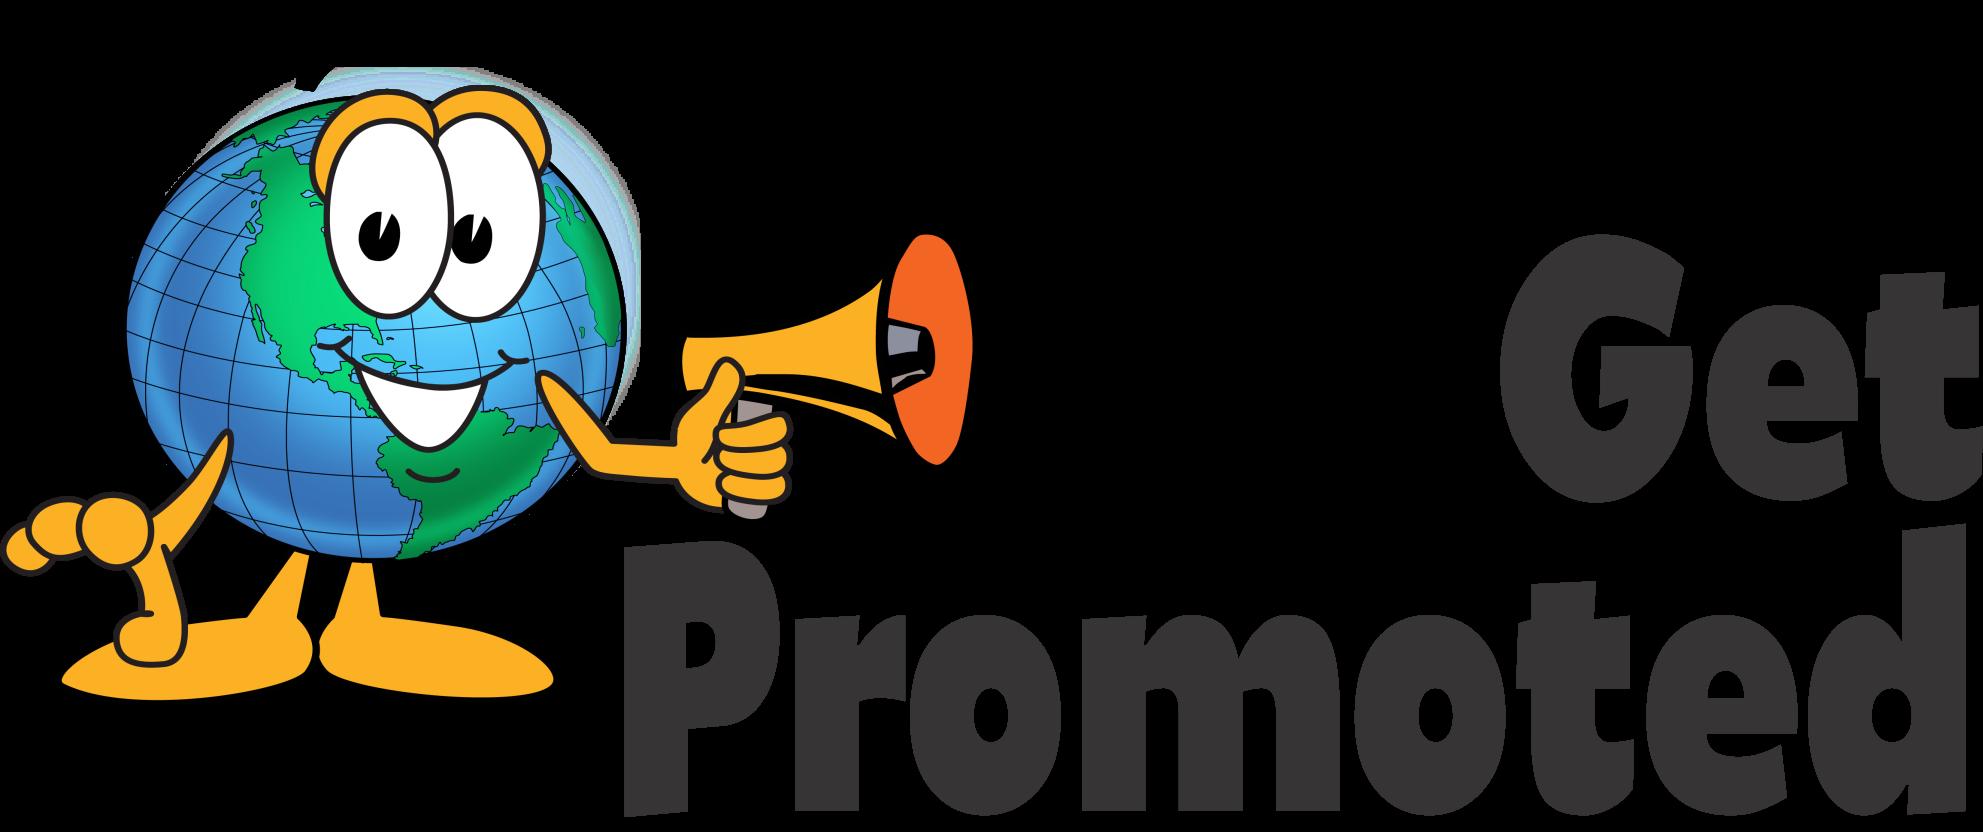 Get Promoted LLC